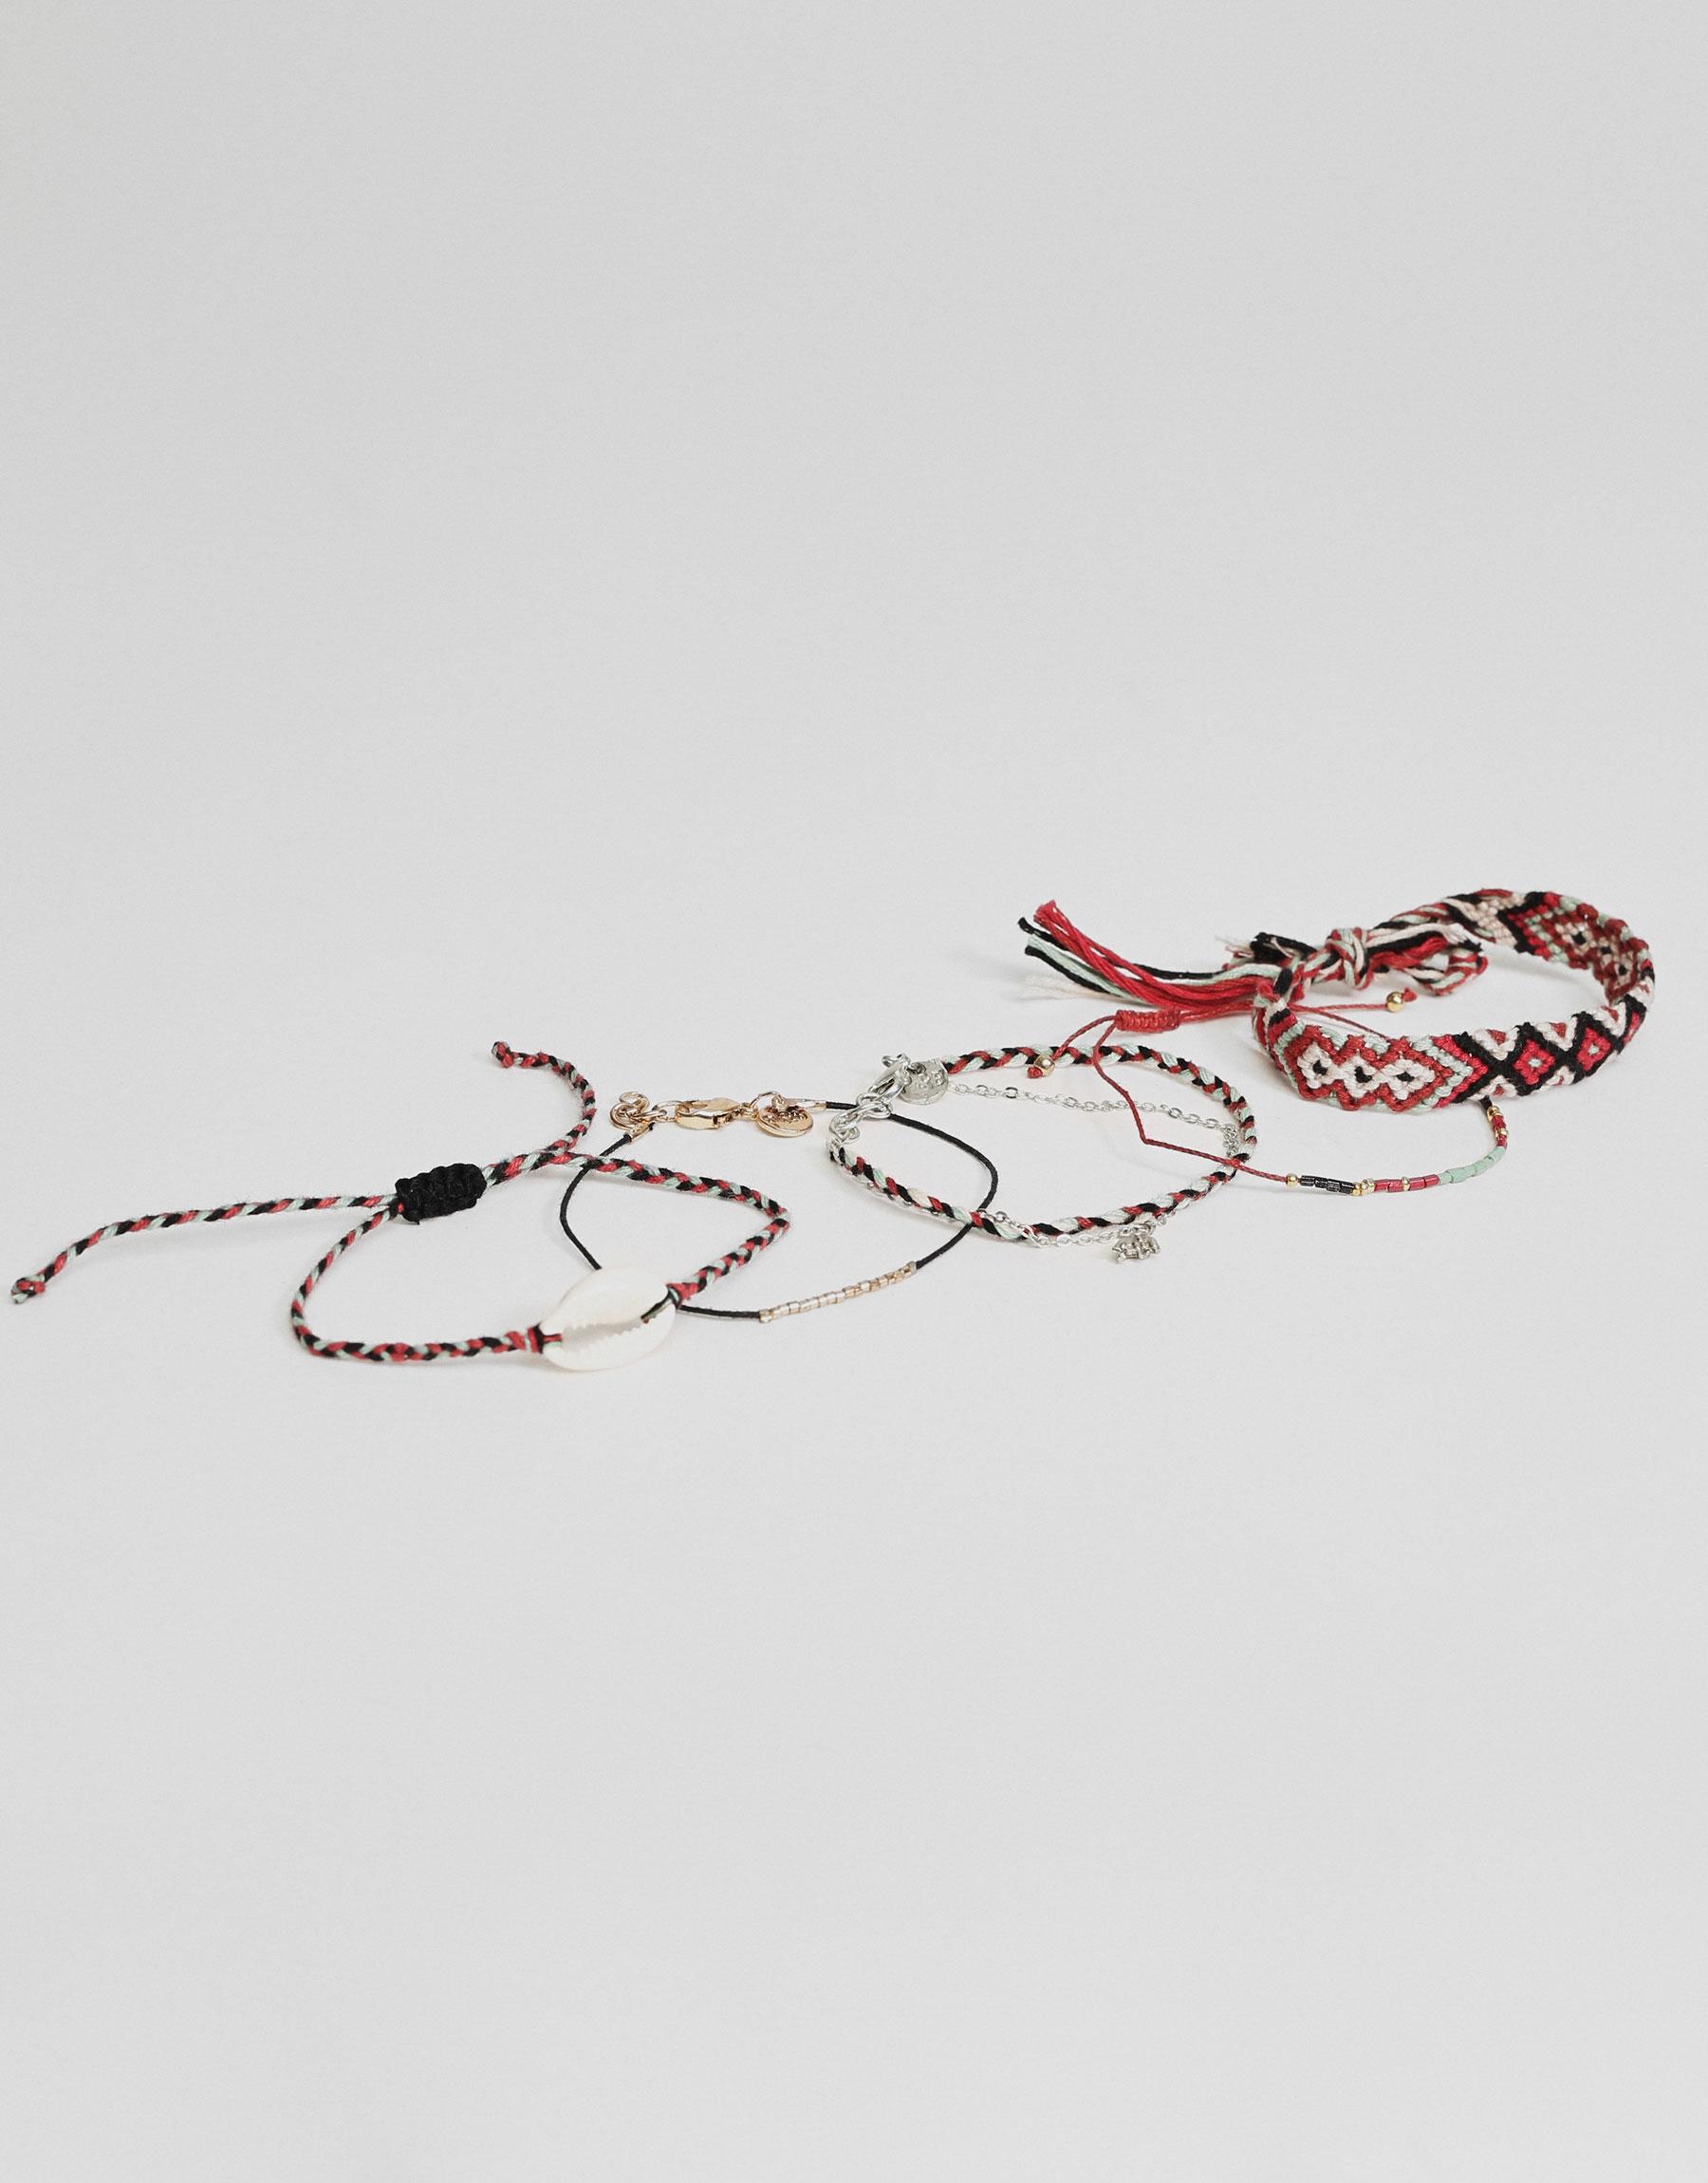 5-Pack of thread bracelets